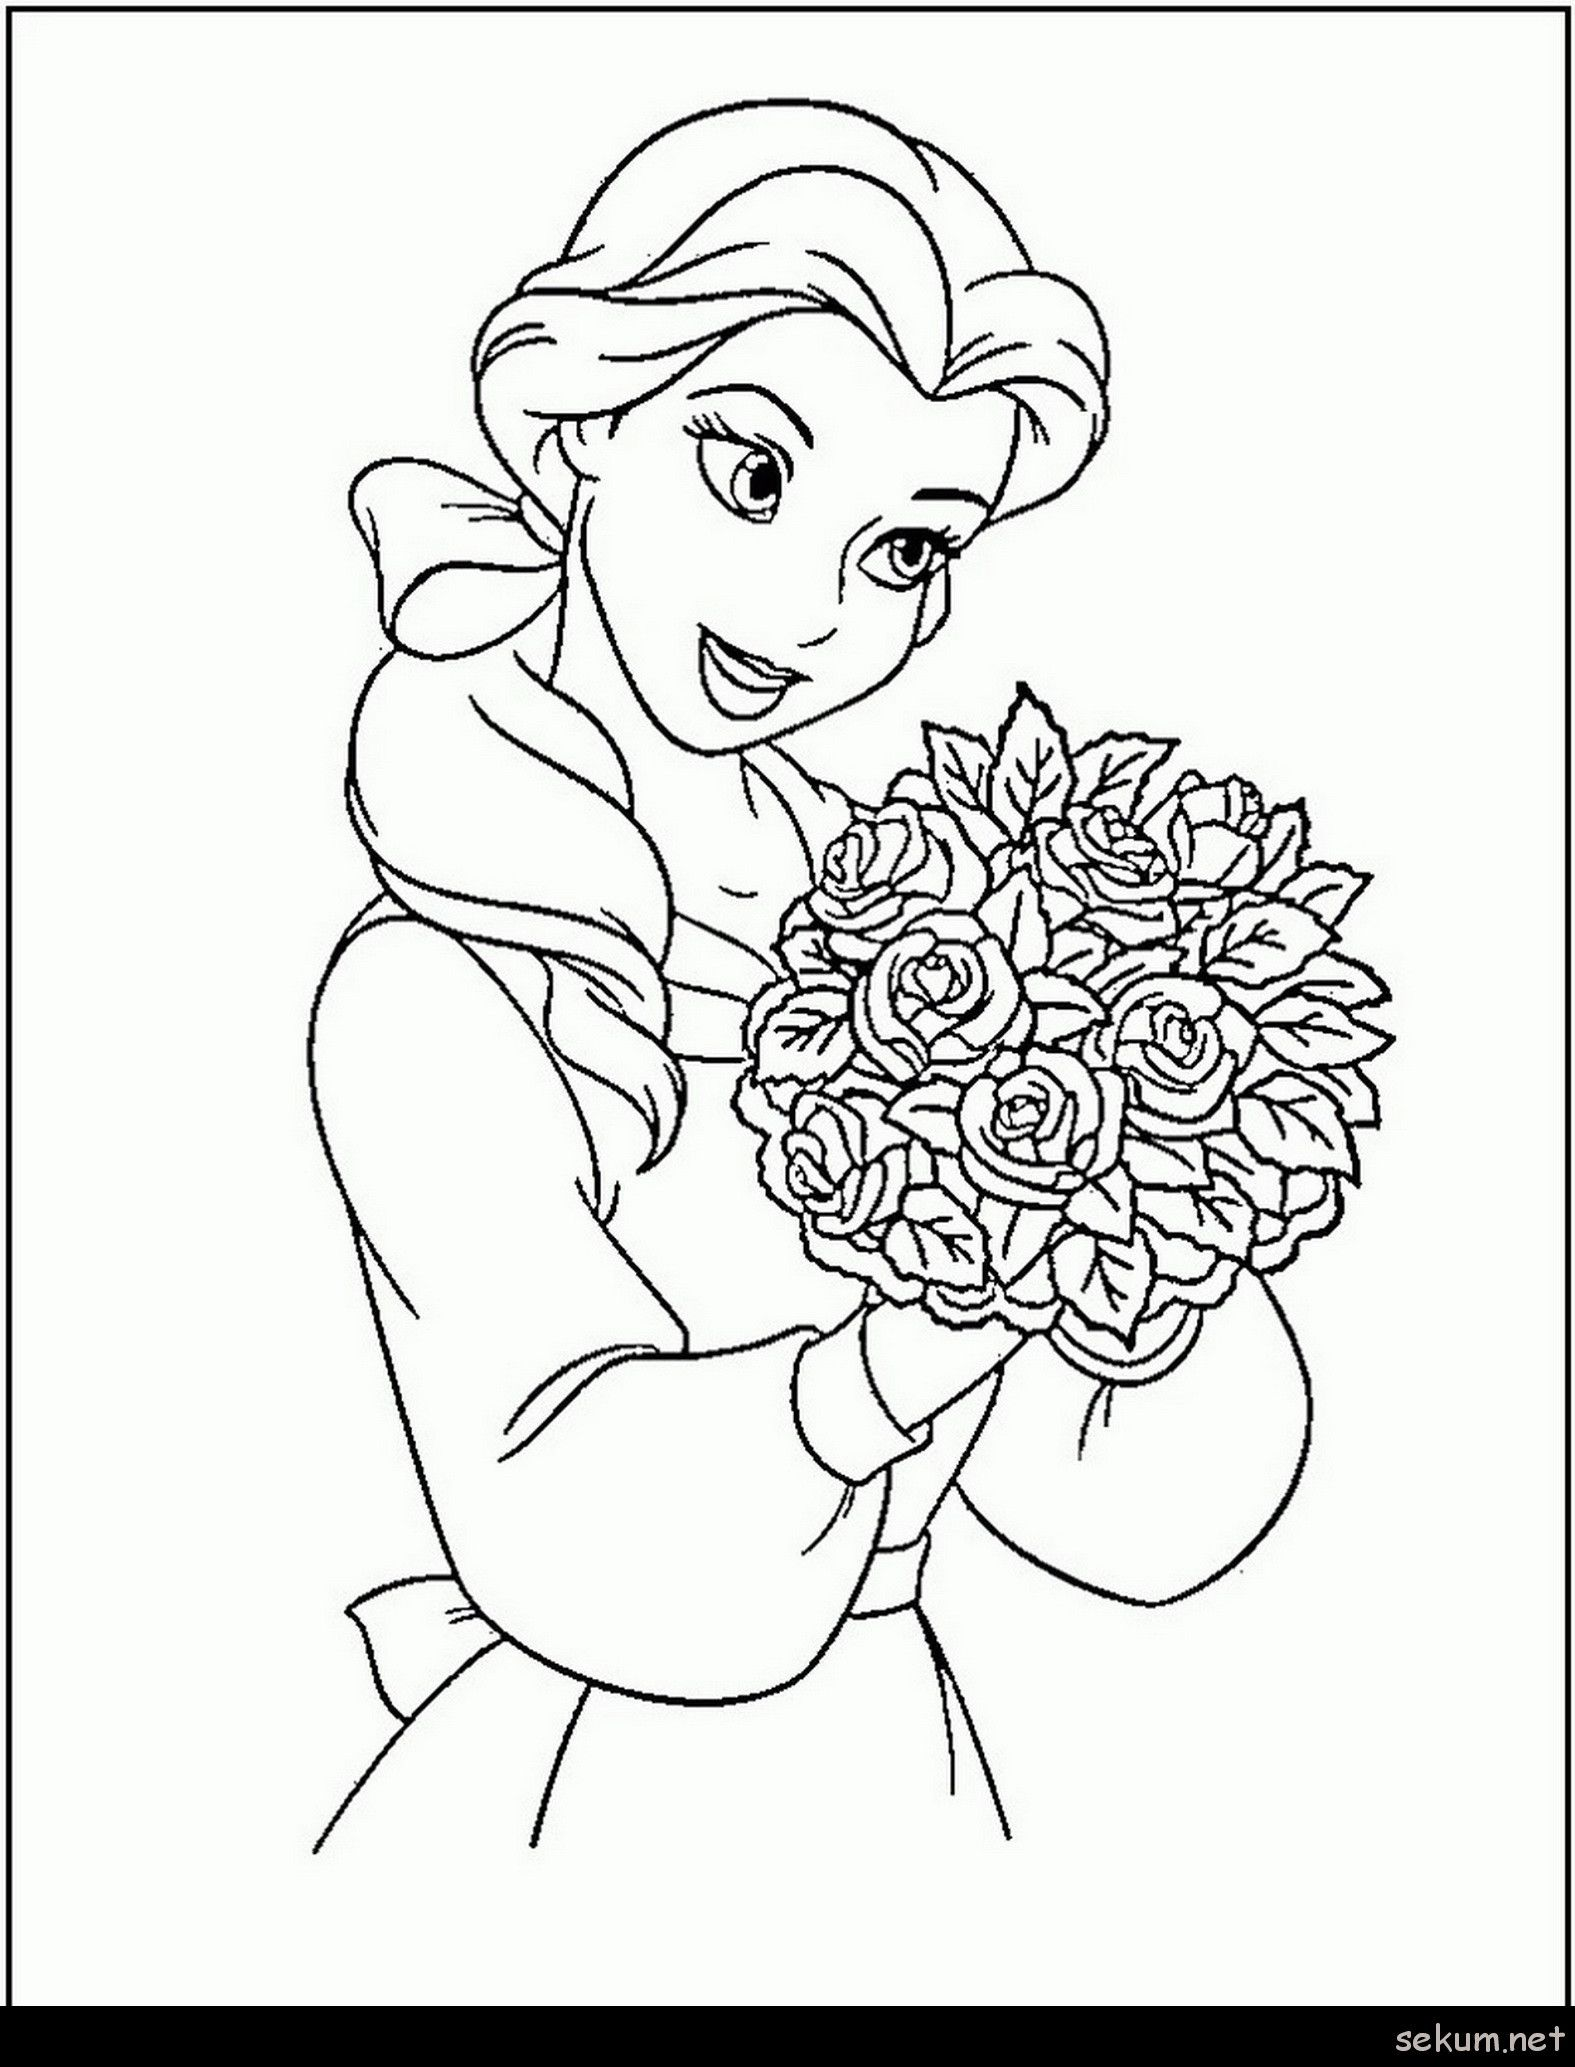 Coloring Page Disney Princess Youngandtae Com Free Disney Coloring Pages Princess Coloring Pages Disney Princess Coloring Pages